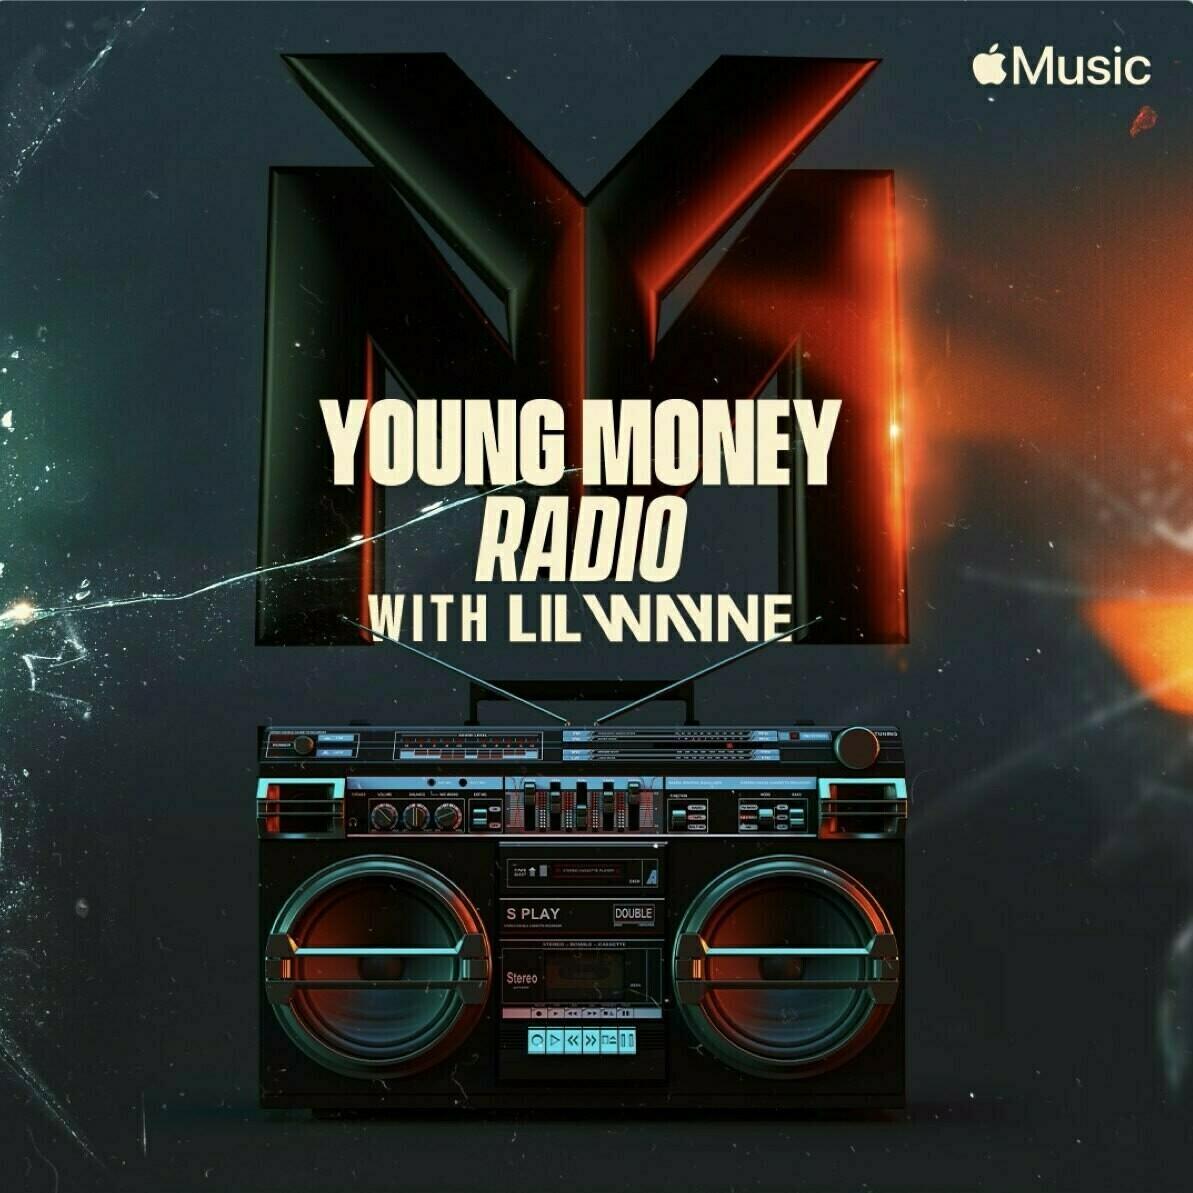 Young Money Radio artwork